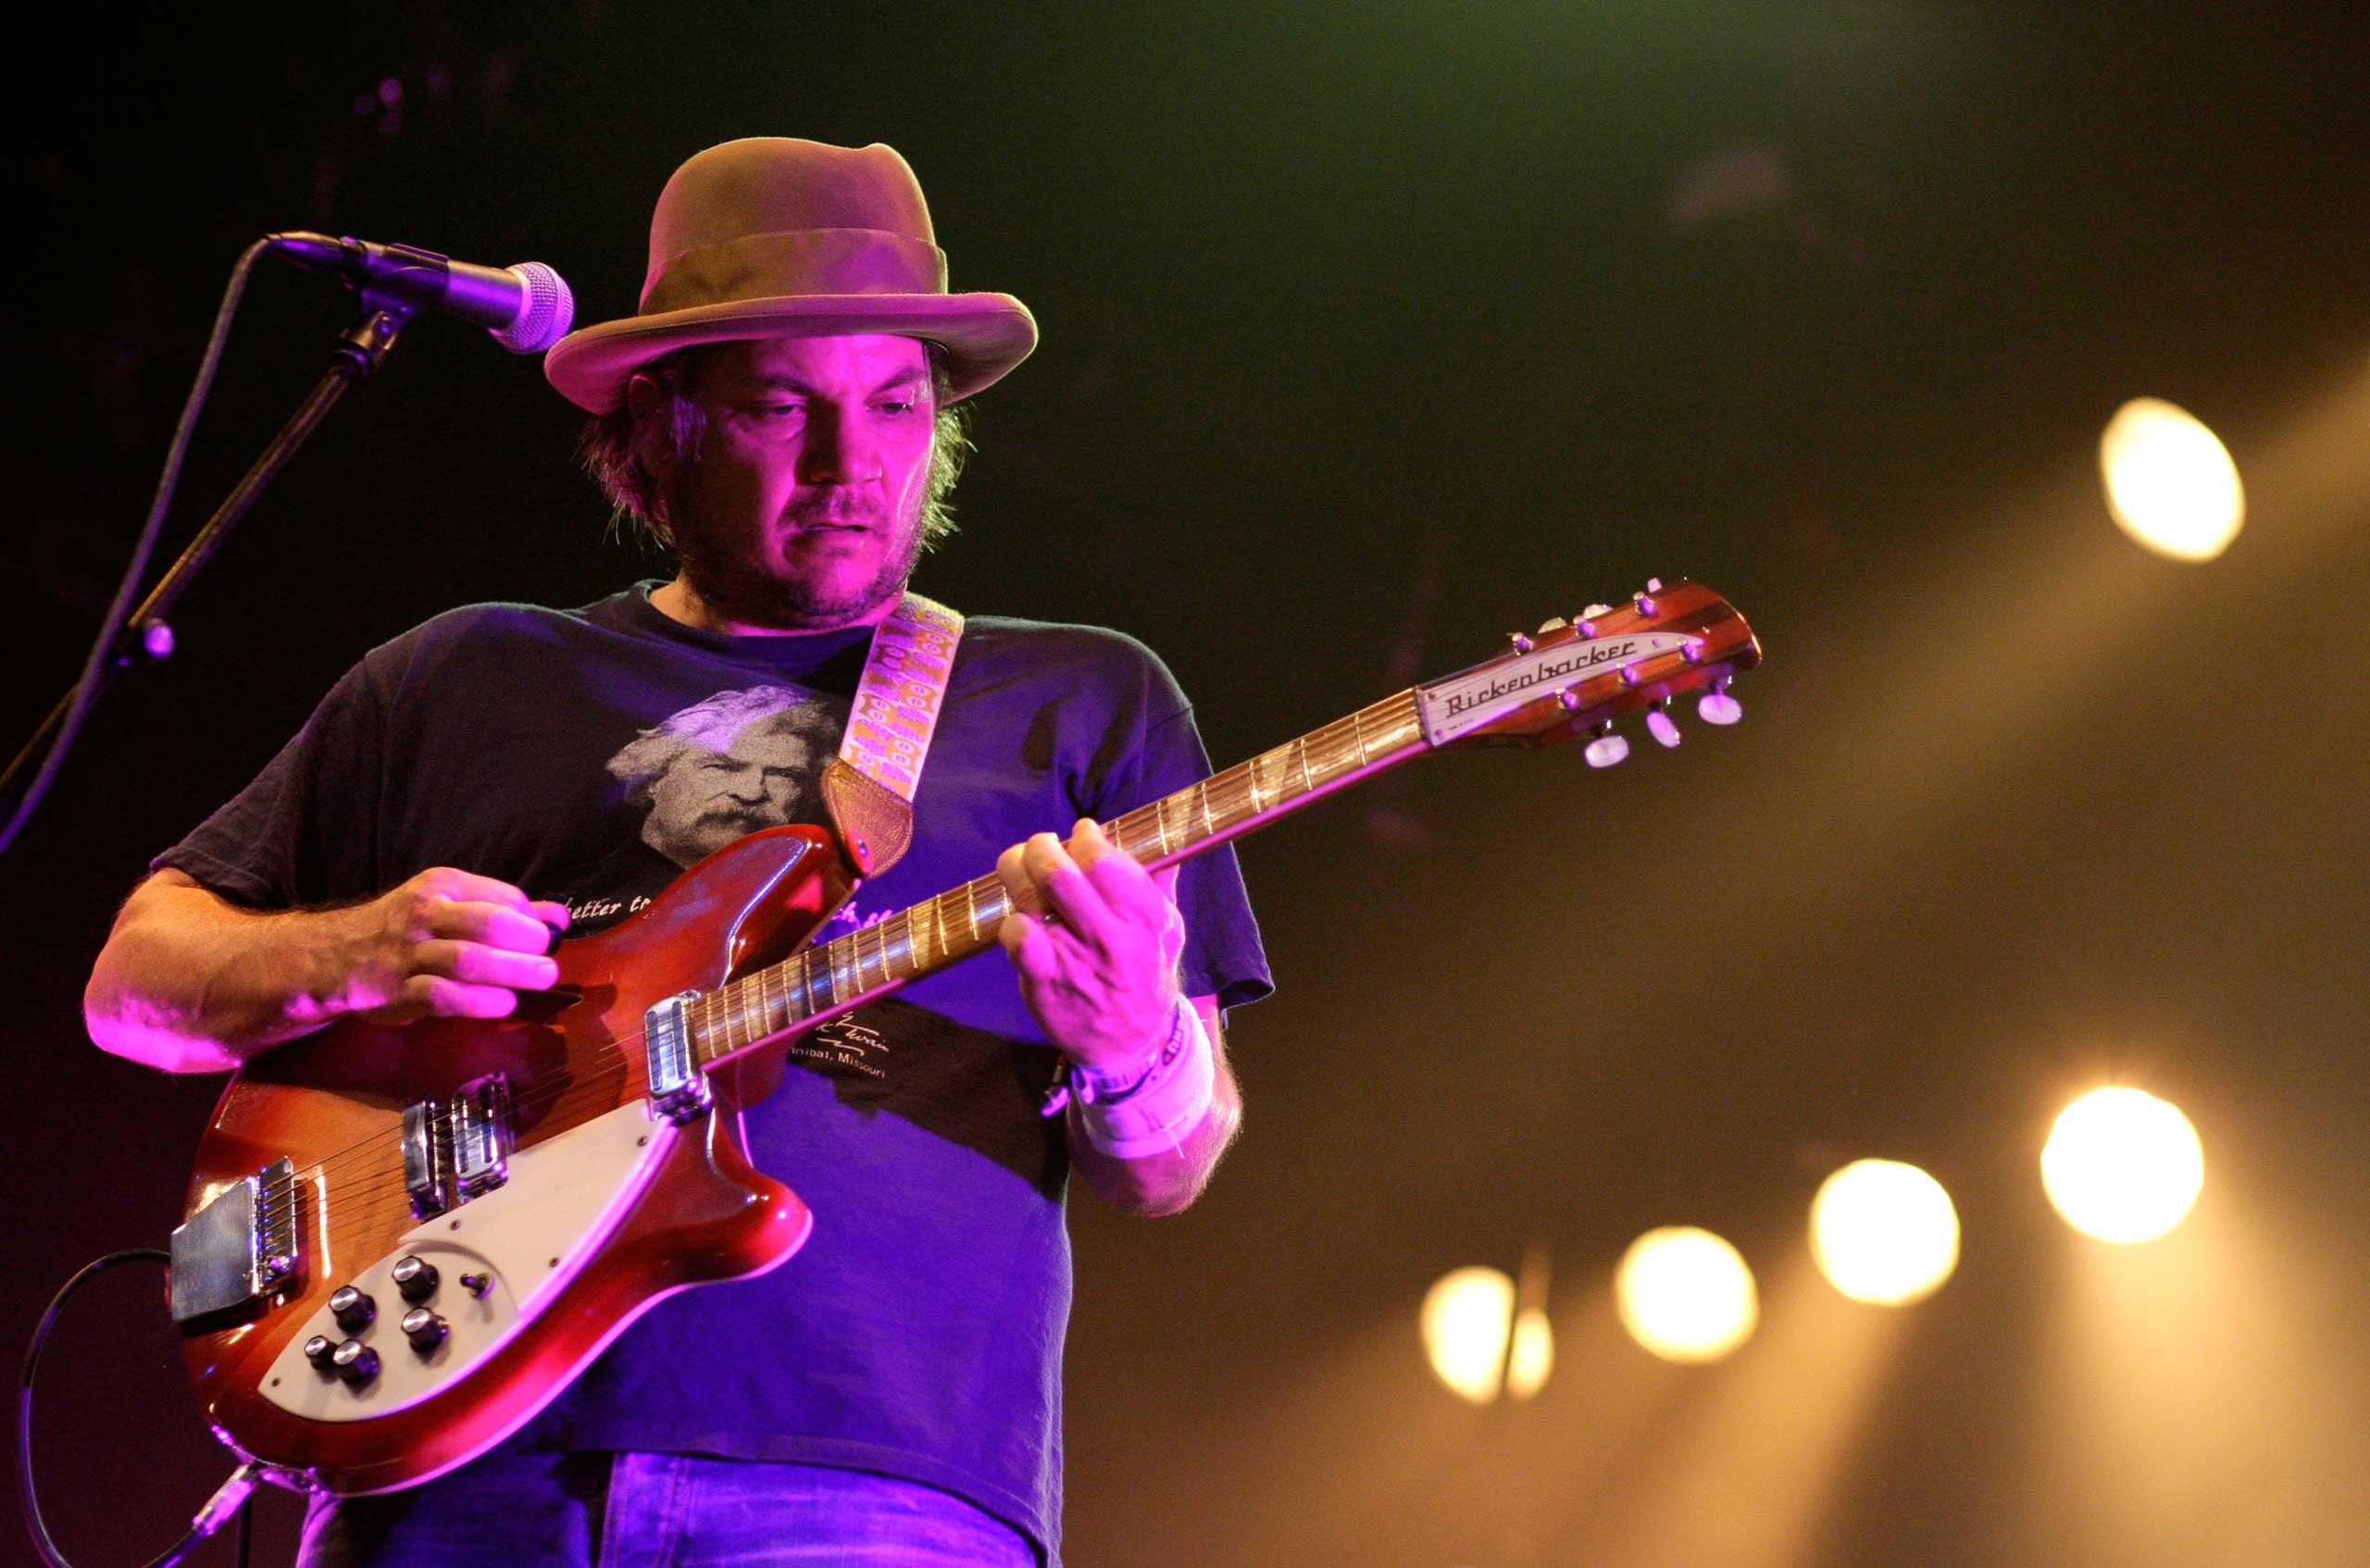 Jeff Tweedy of Wilco performs in 2012.